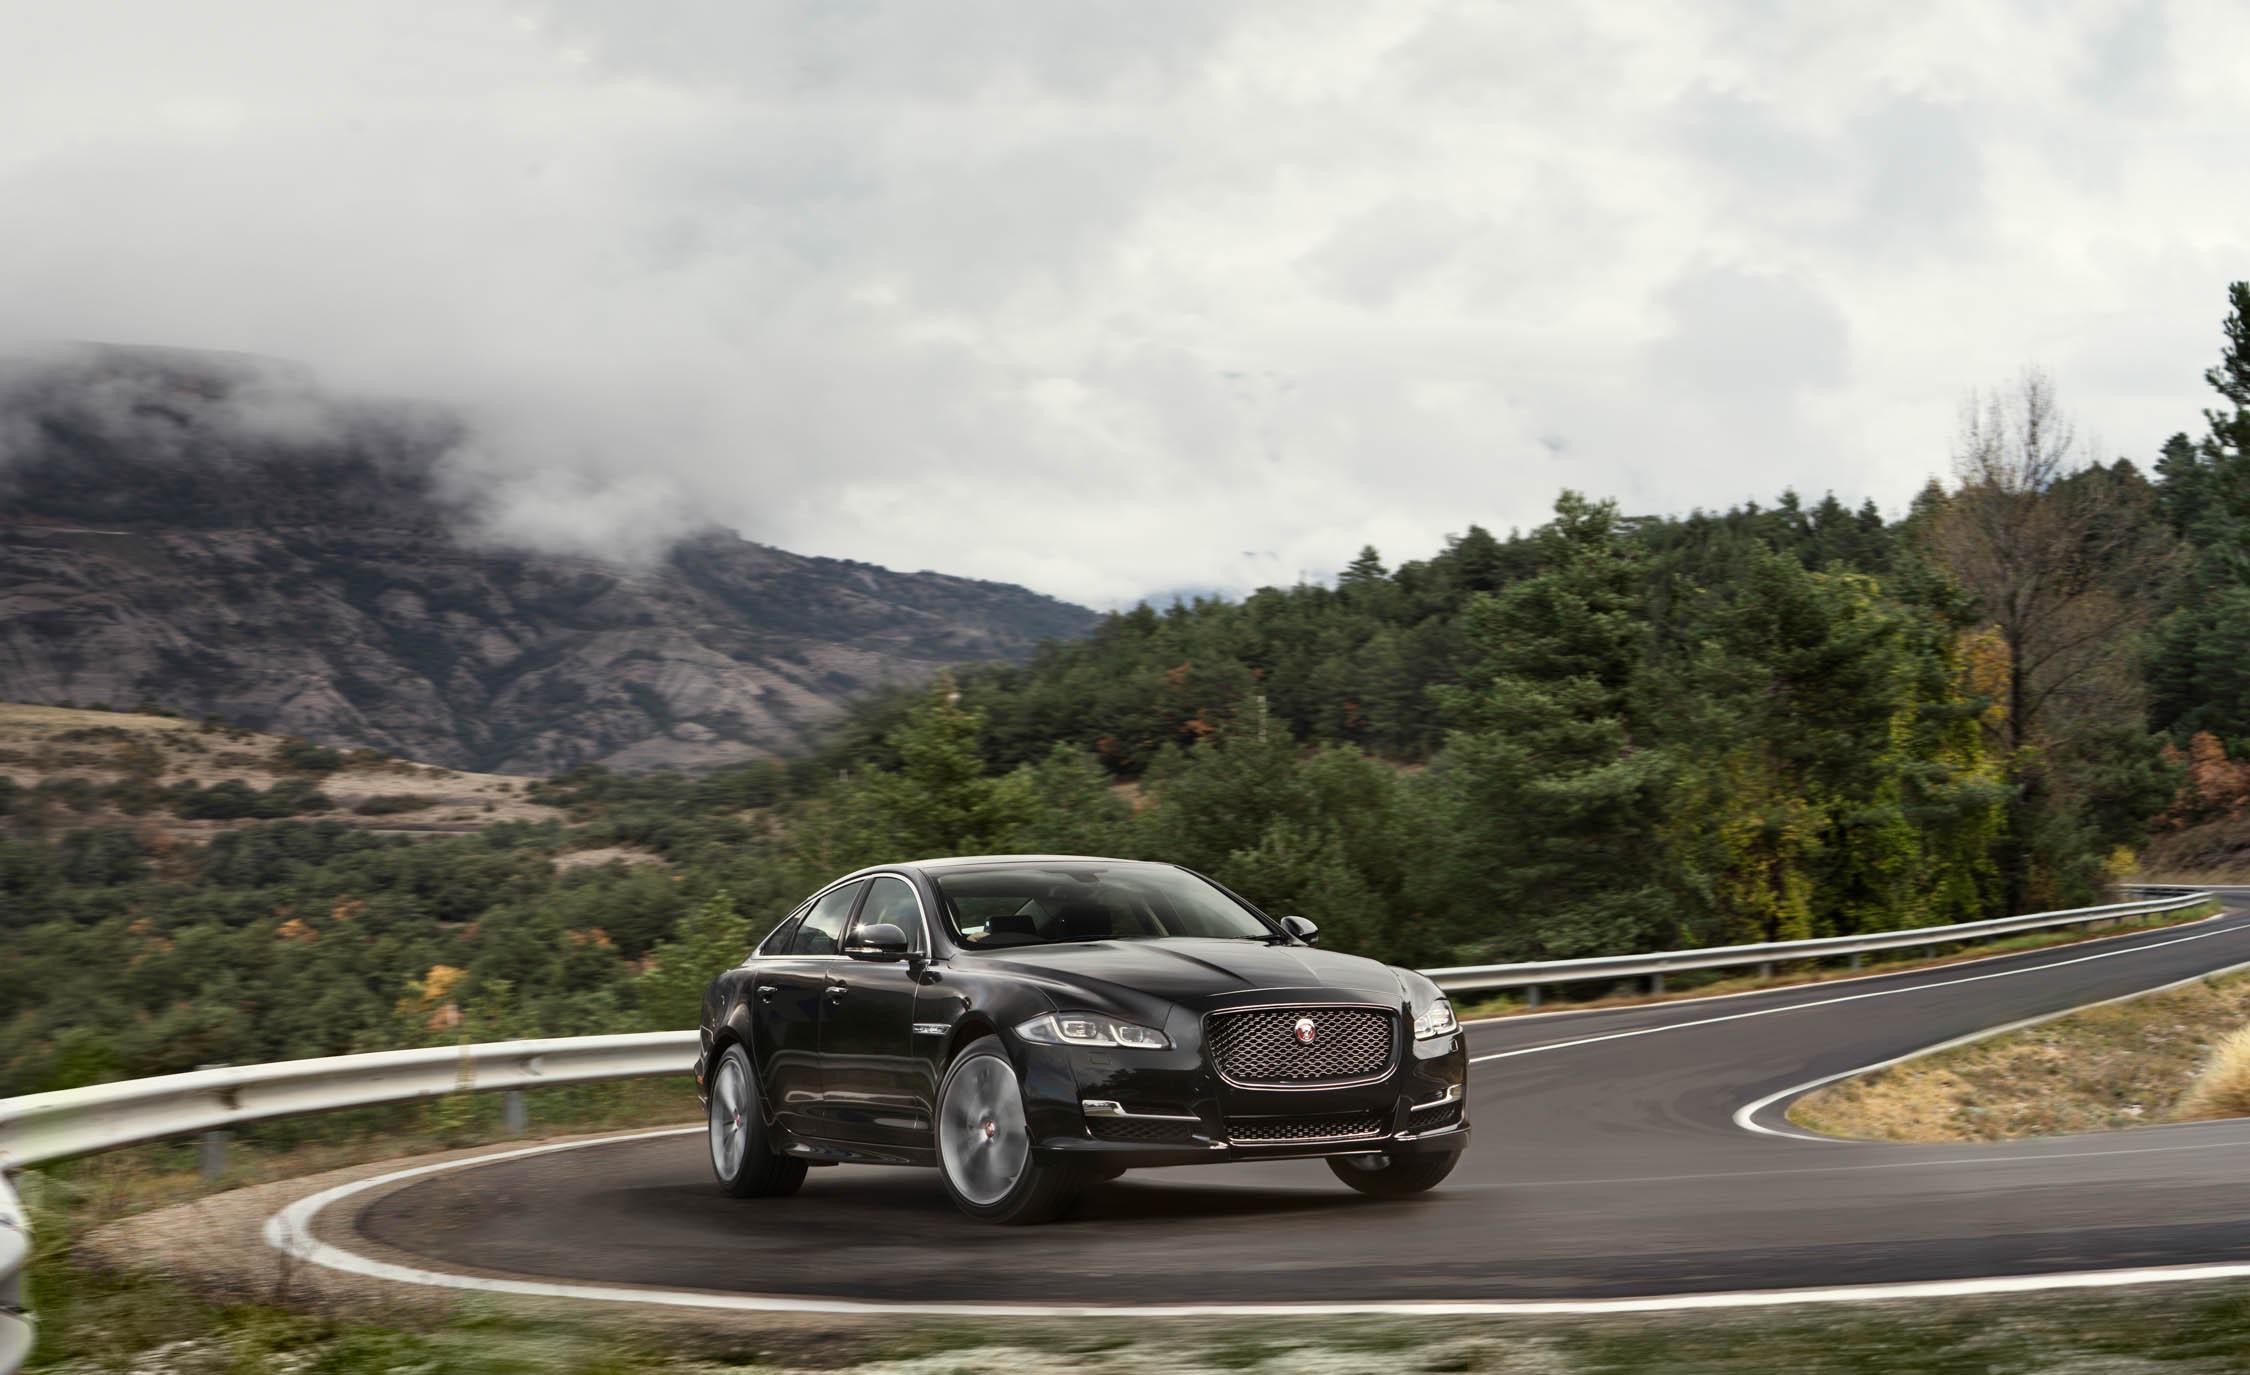 2016 Jaguar XJ (Photo 1 of 19)